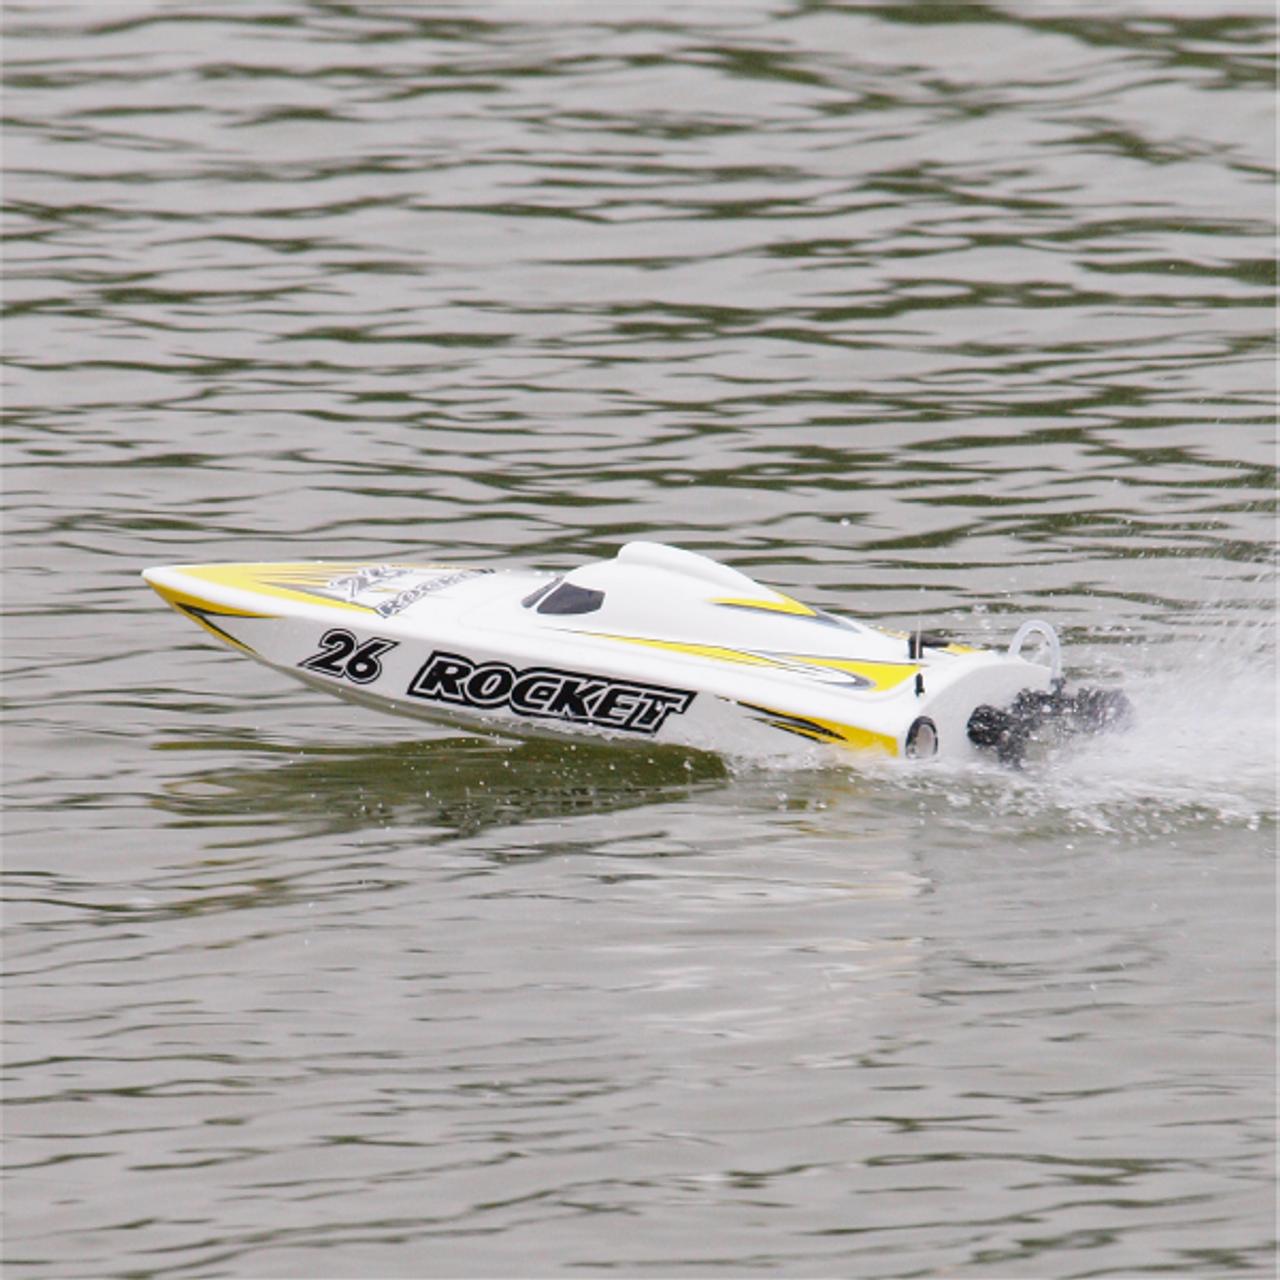 Joysway ROCKET V2 RC Boat Deep-V Hull Brushless Electric 8651 Ready to Run